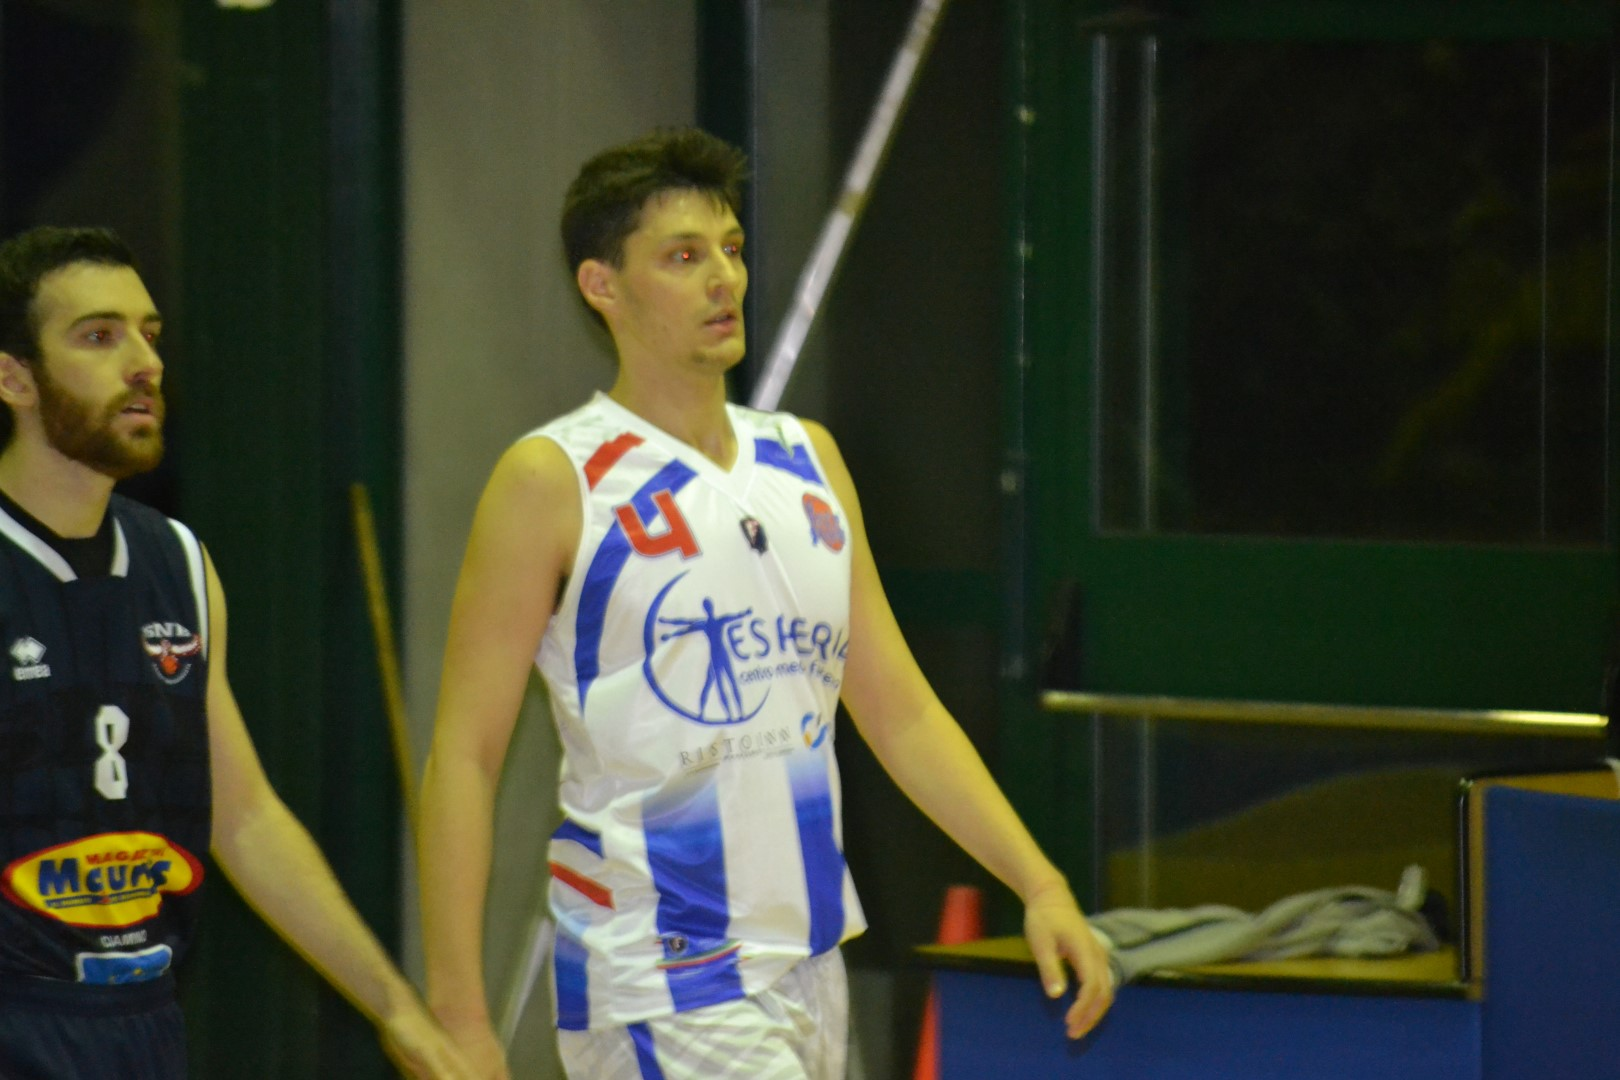 Francesco Manzotti